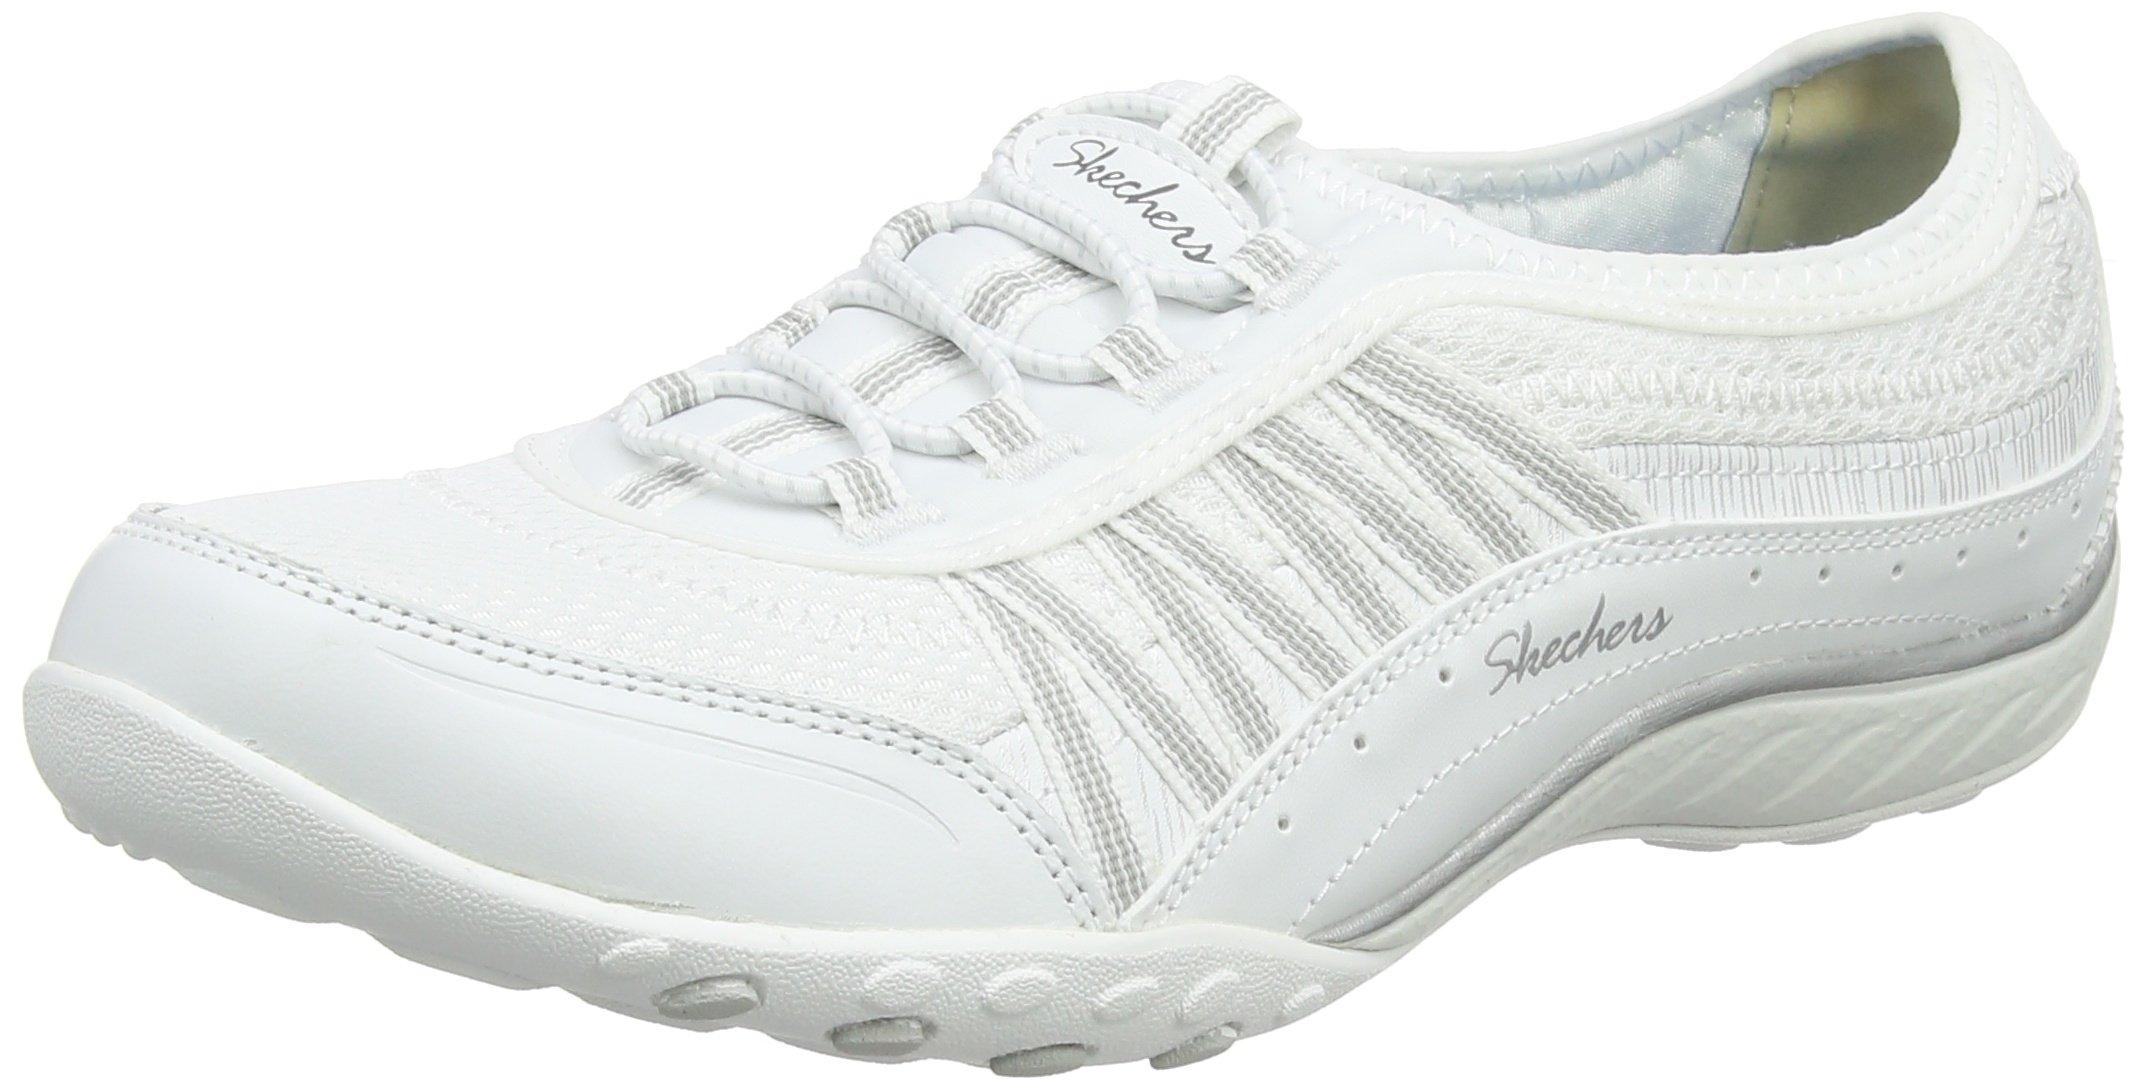 Skechers Women's 23041 Trainers, White (White/Silver), 3 UK 36 EU